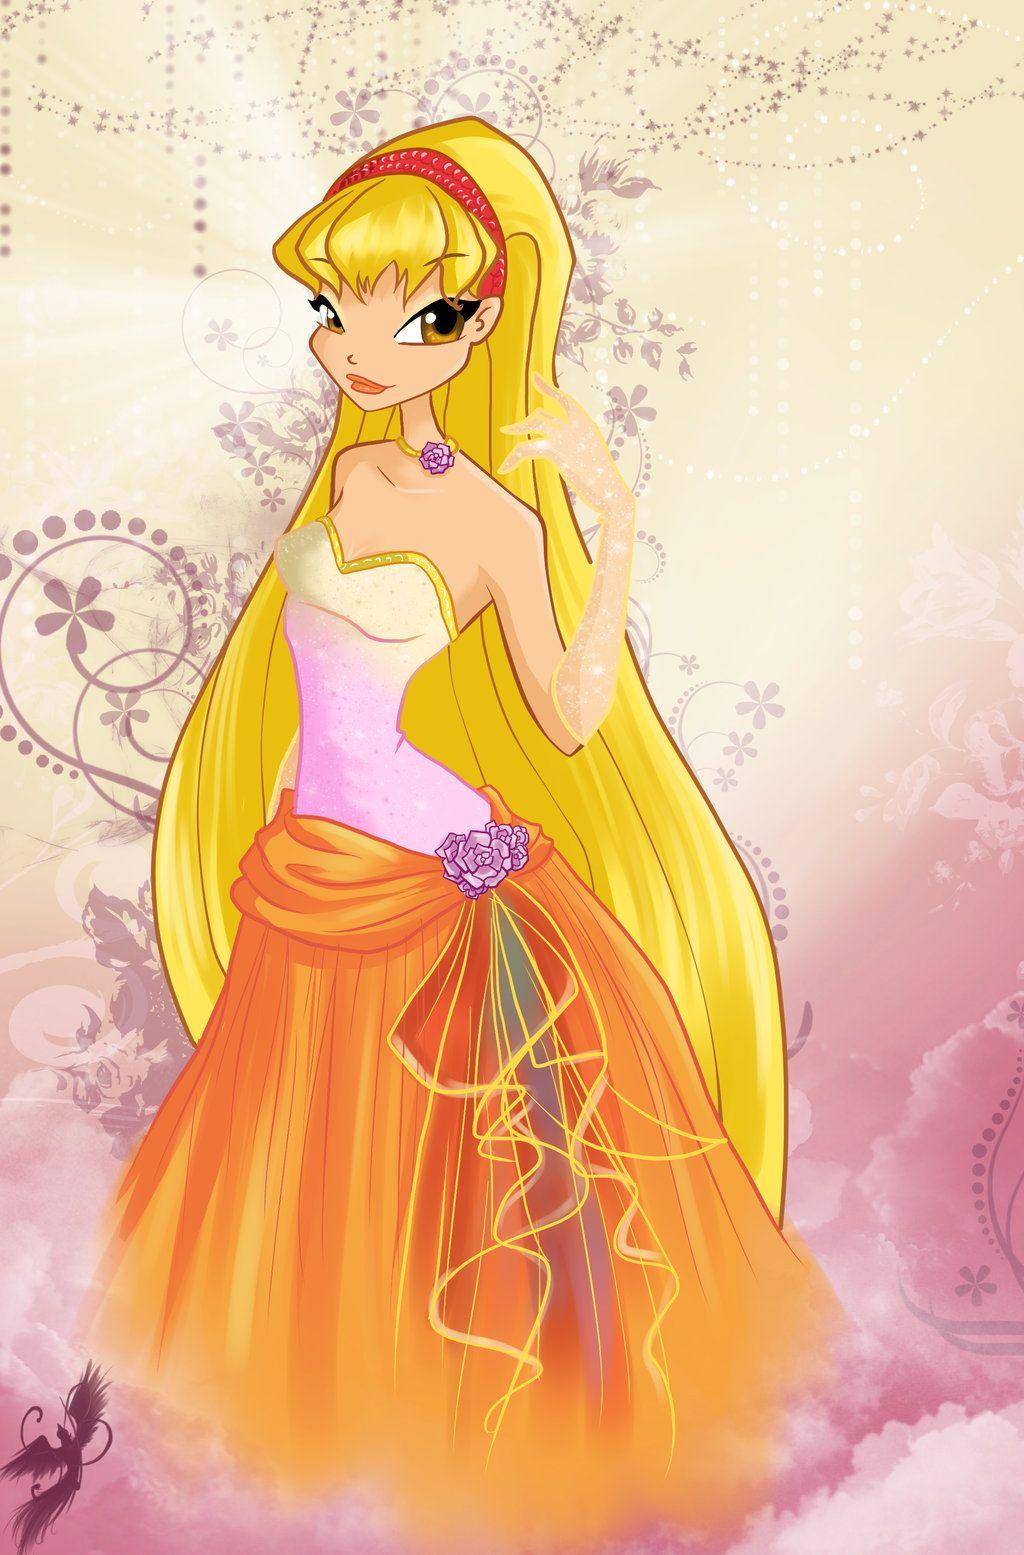 Dress up winx club - Winx Club Dress Up Stella Ball Dress By Fantazyme